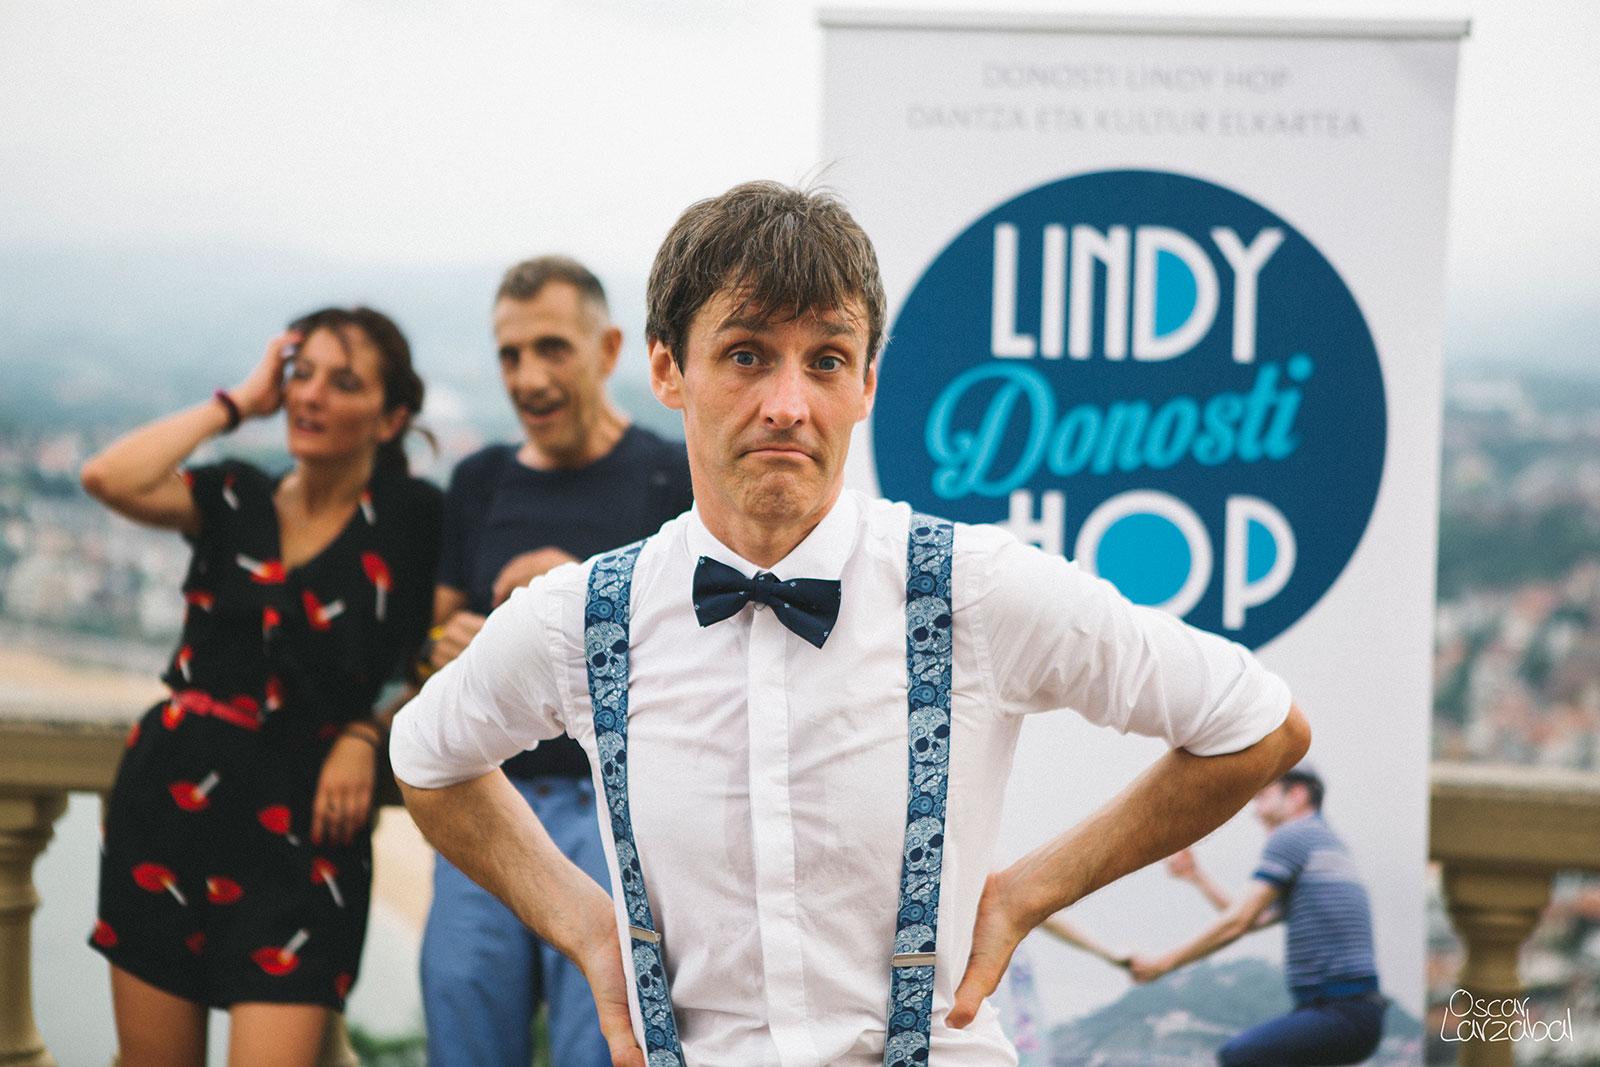 Fotografo Swing lindy hop San Sebastian Donostia